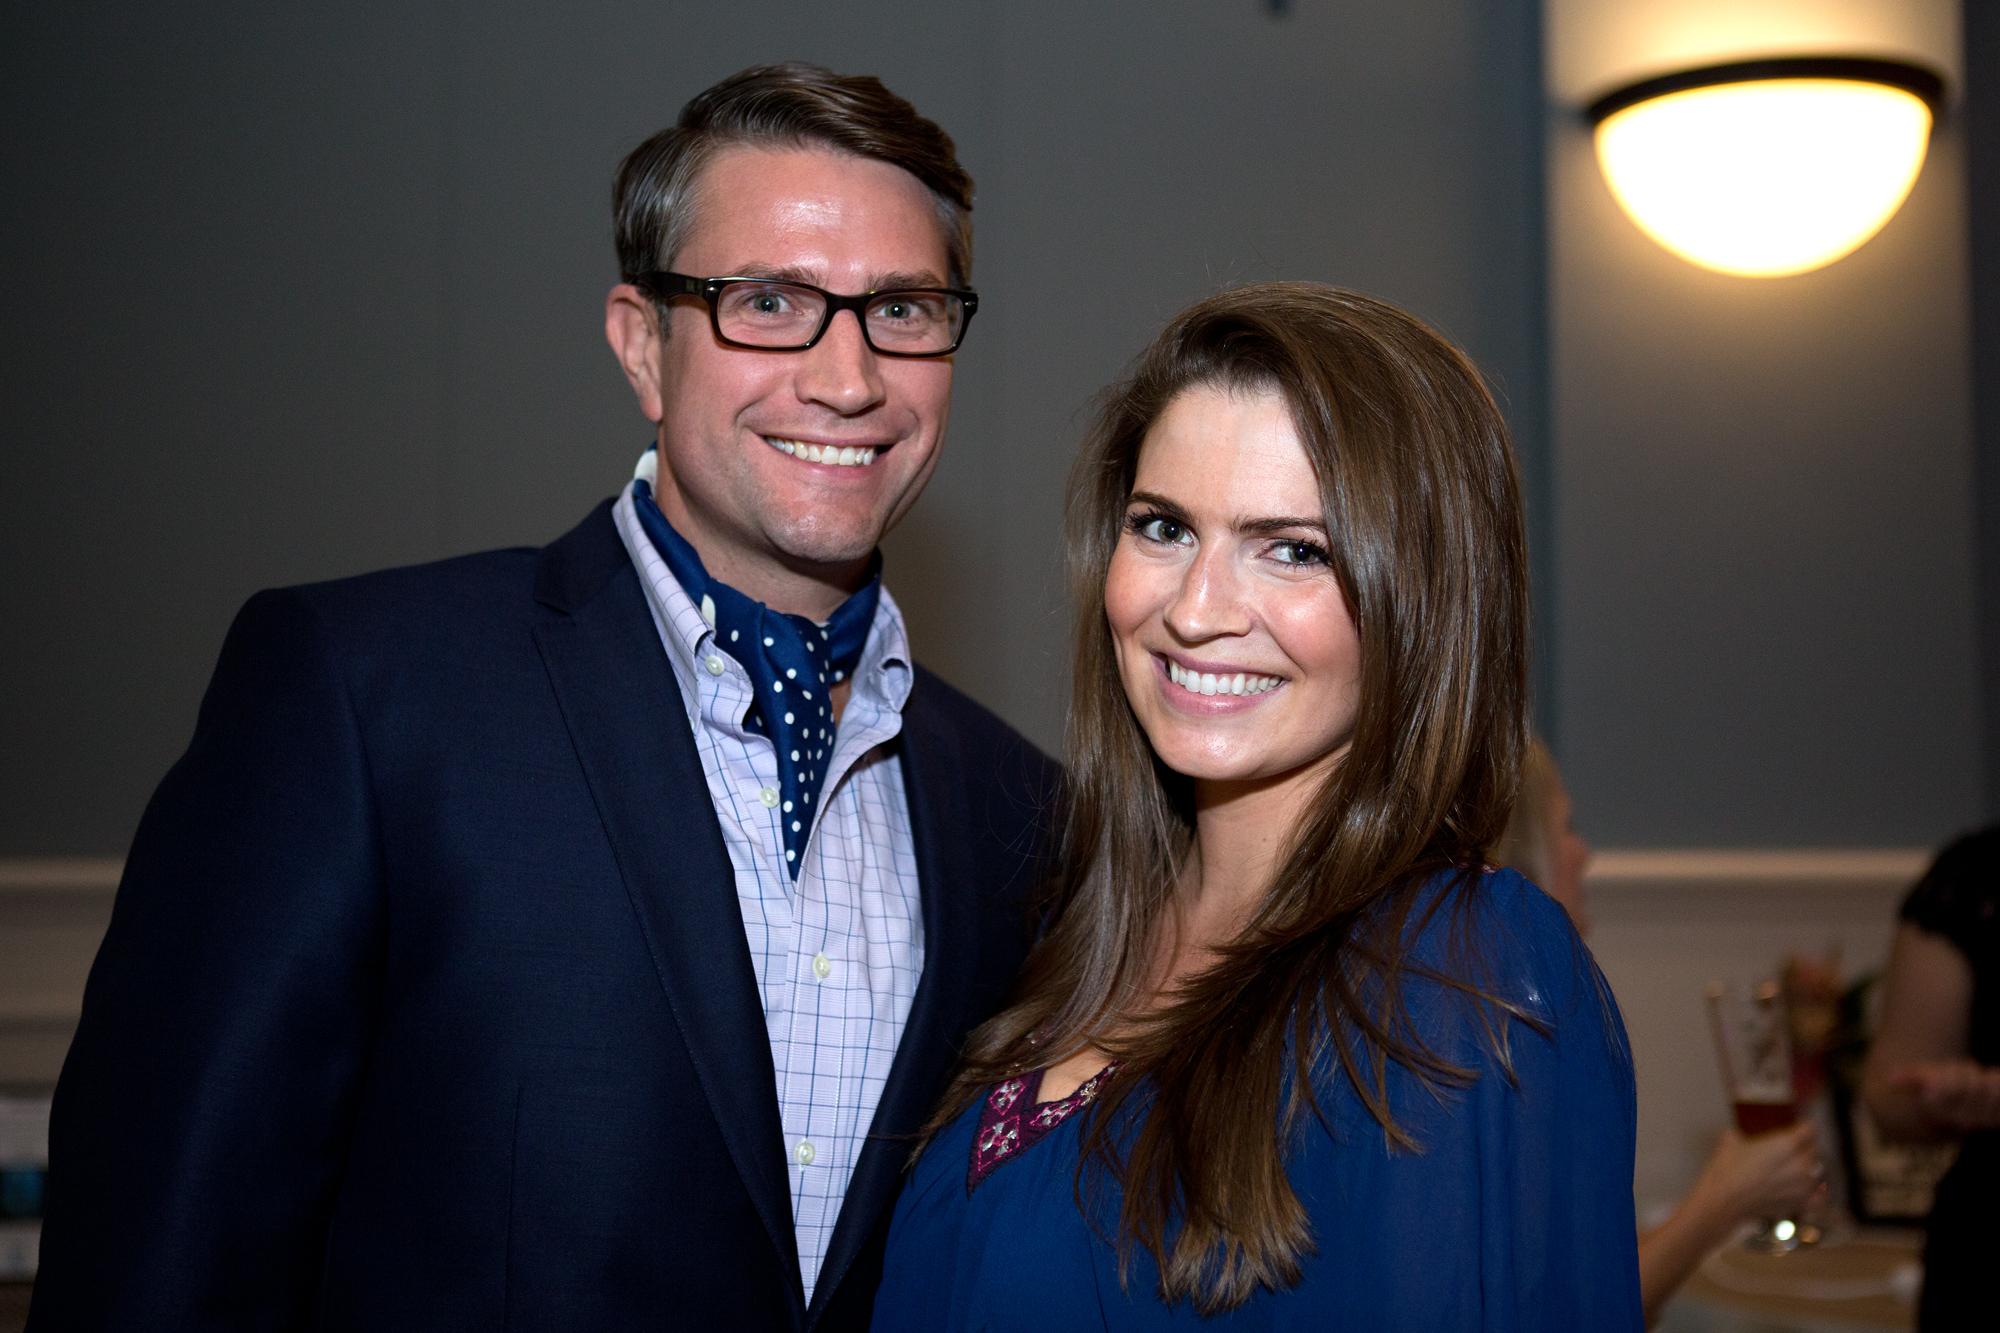 Heath Johnson and Lelia Burress